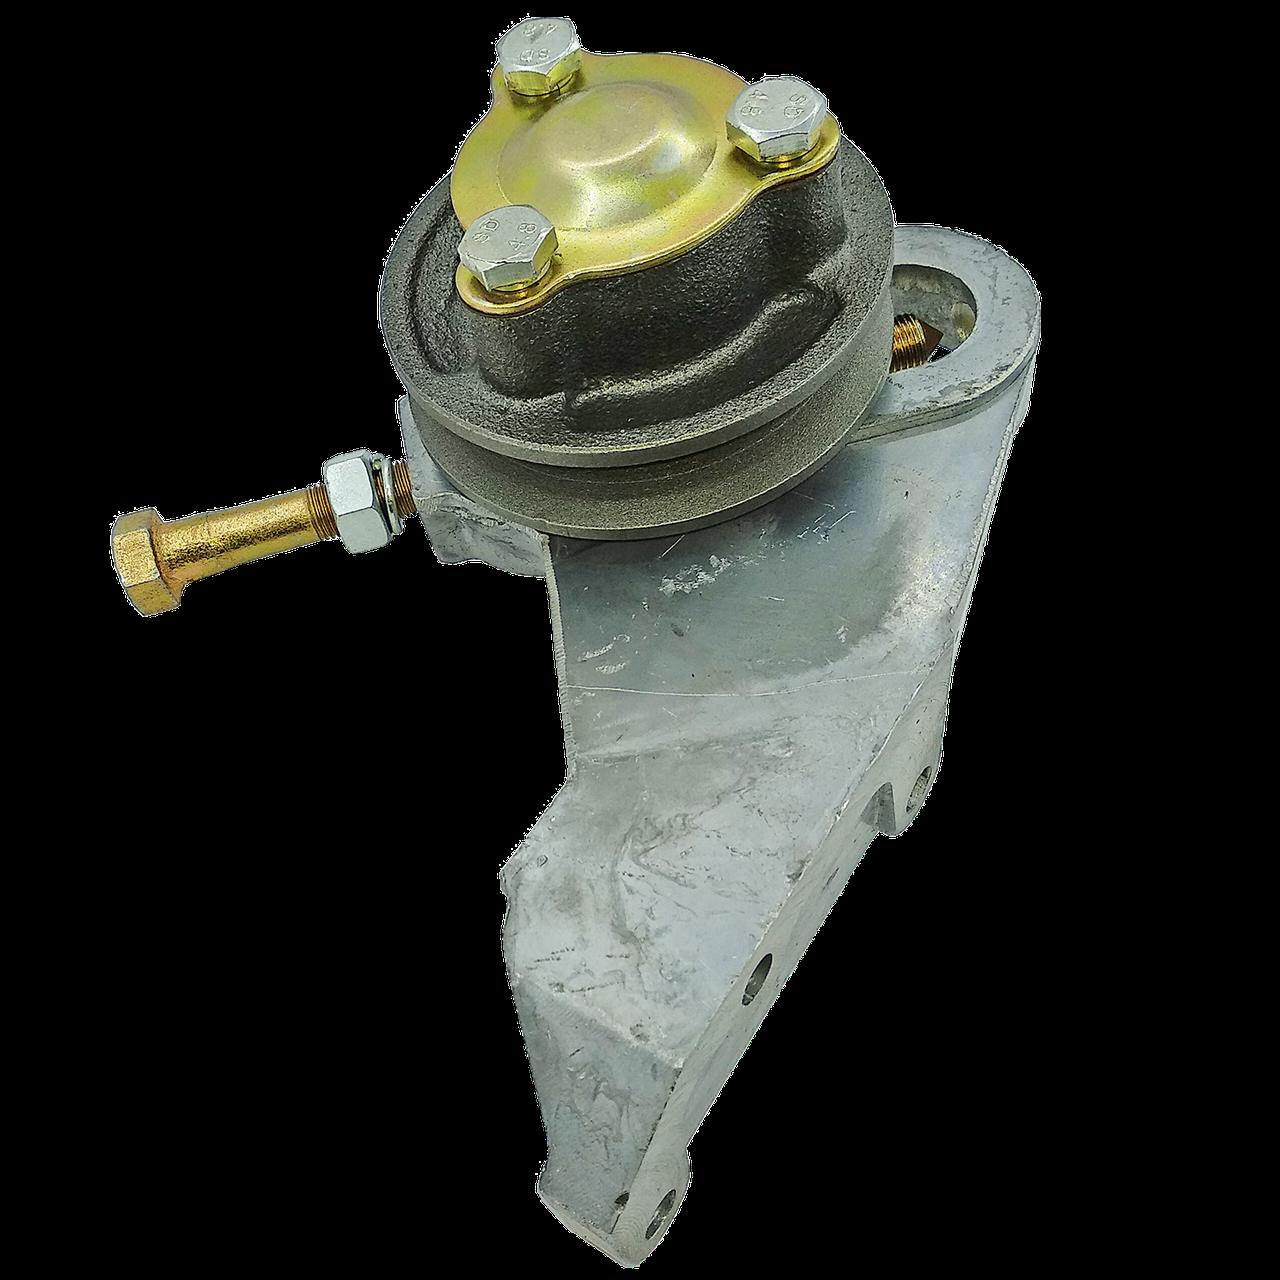 Натяжное устройство привода компрессора ЯМЗ-236 236-3509300. Натягувач ременя приводу компресора